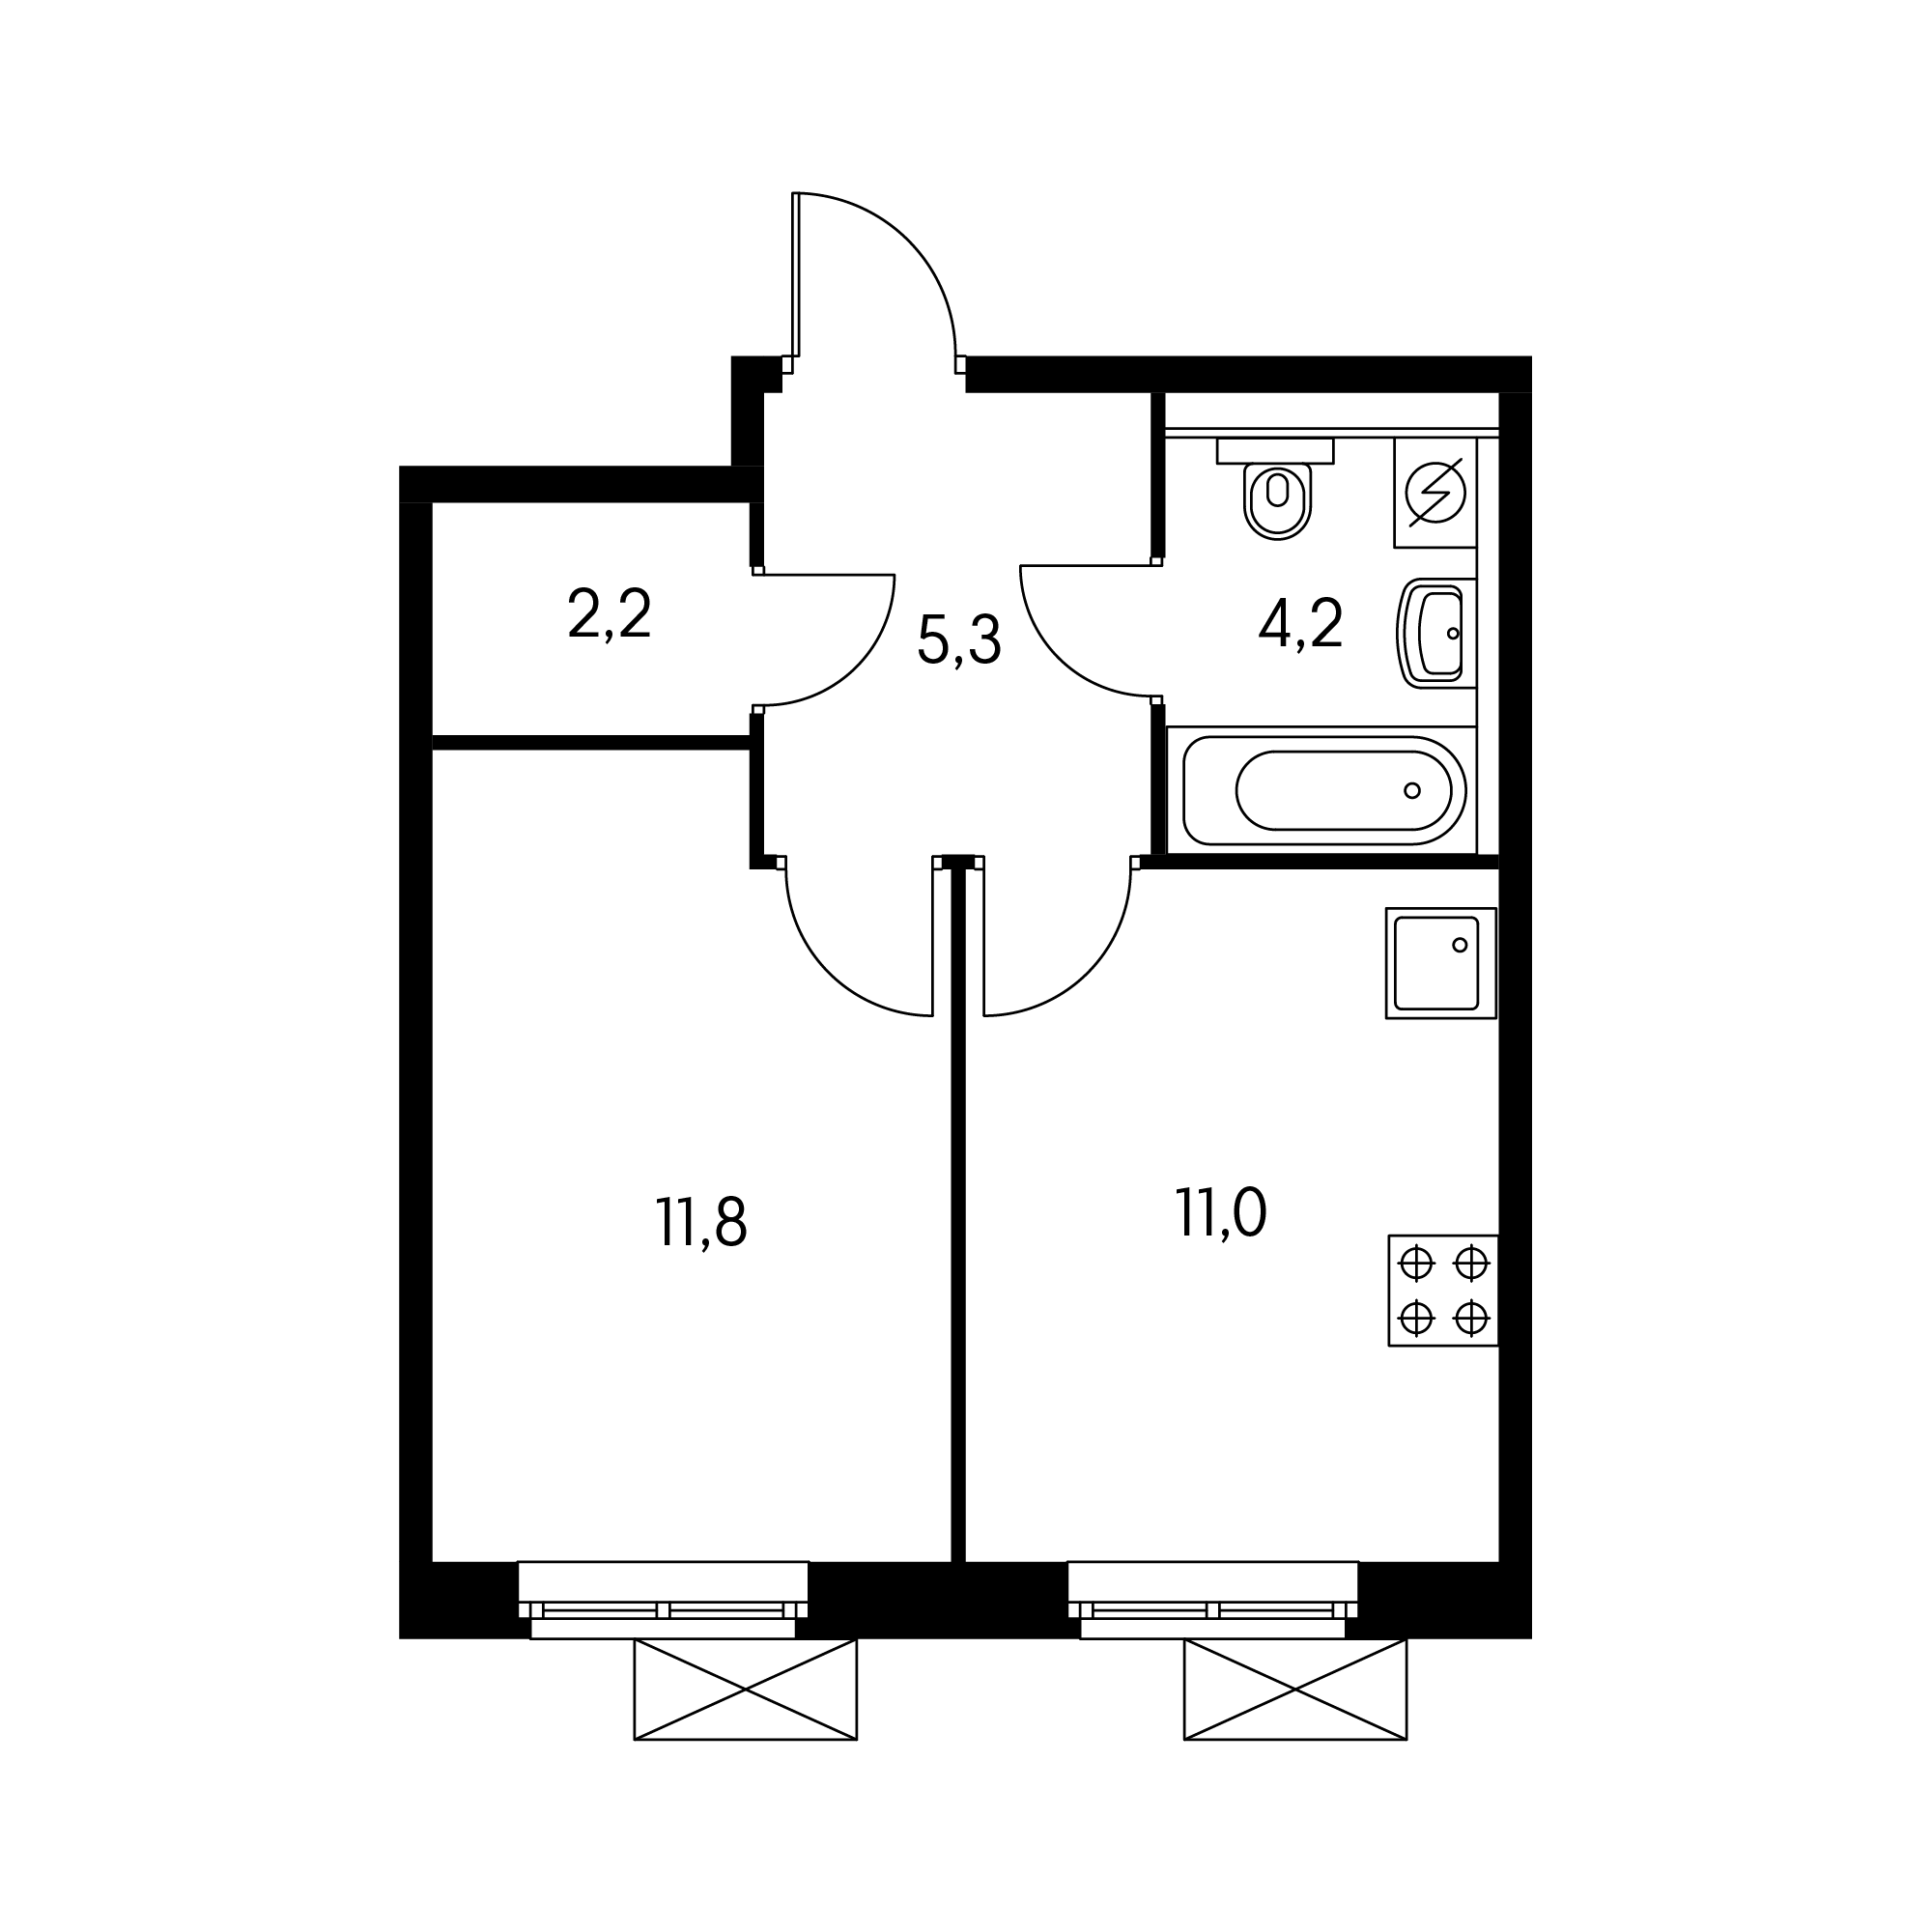 1KS2_6.0-1